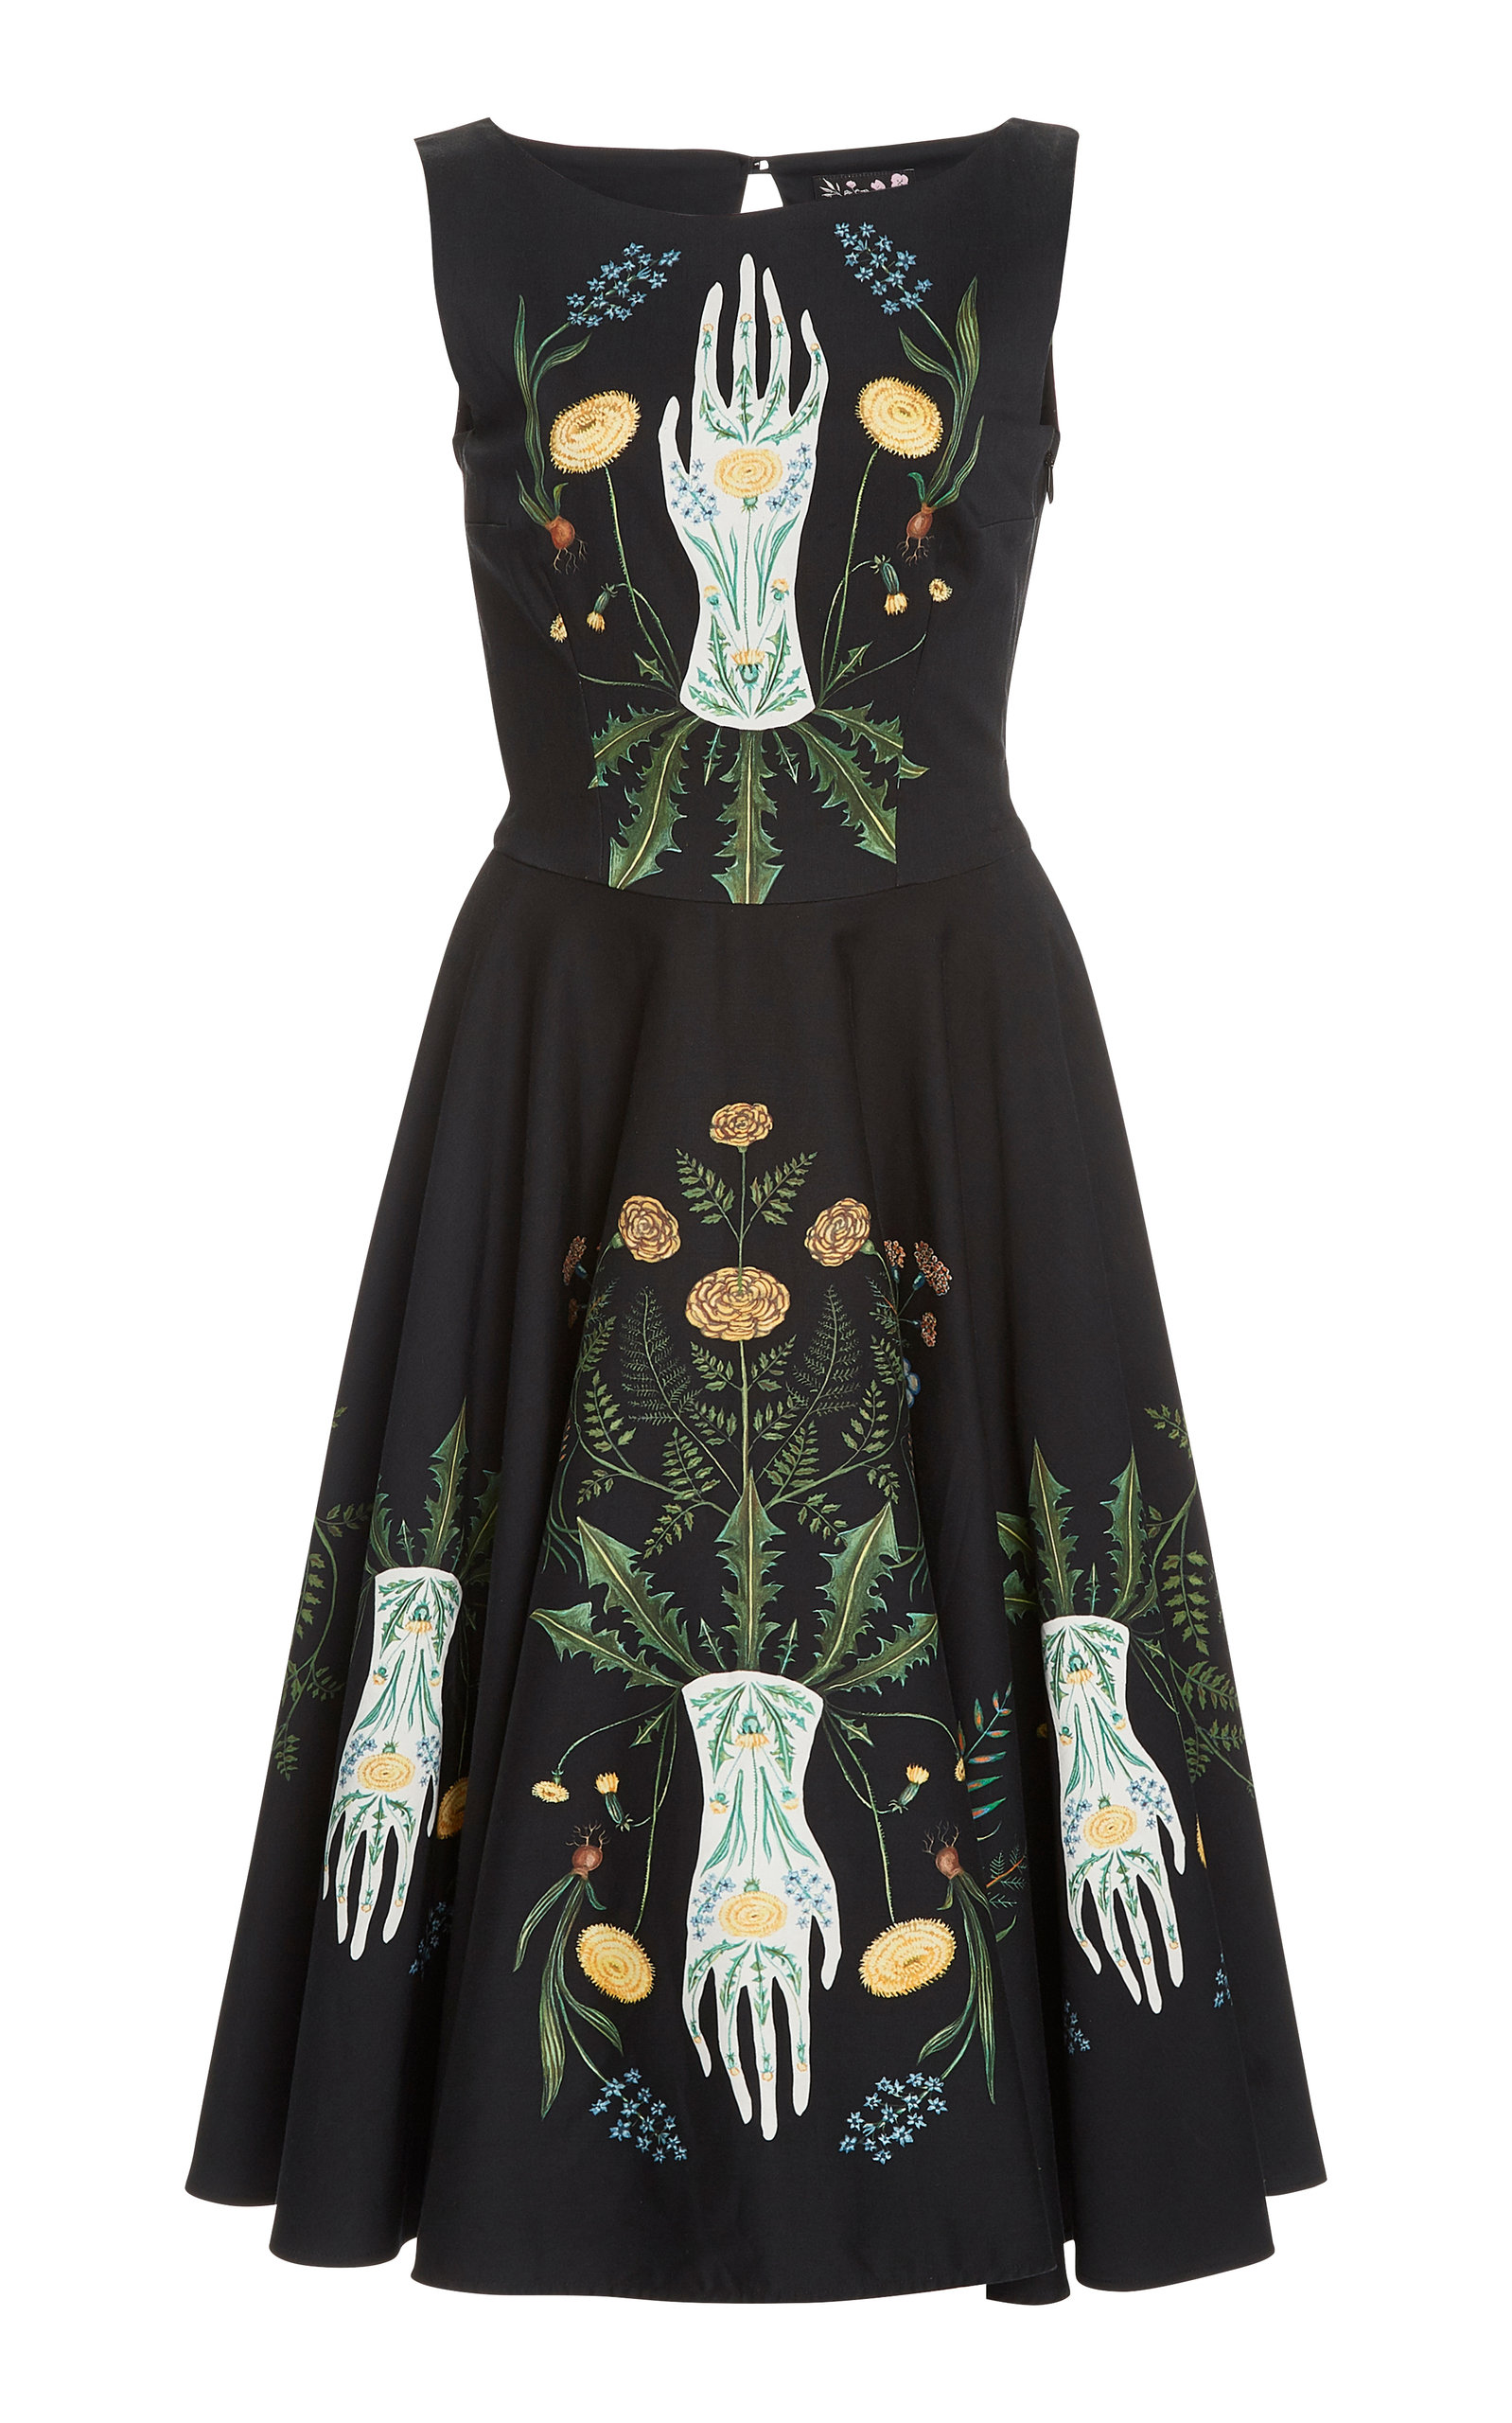 Buy Lena Hoschek White Witch Printed Cotton-Blend Midi Dress online, shop Lena Hoschek at the best price